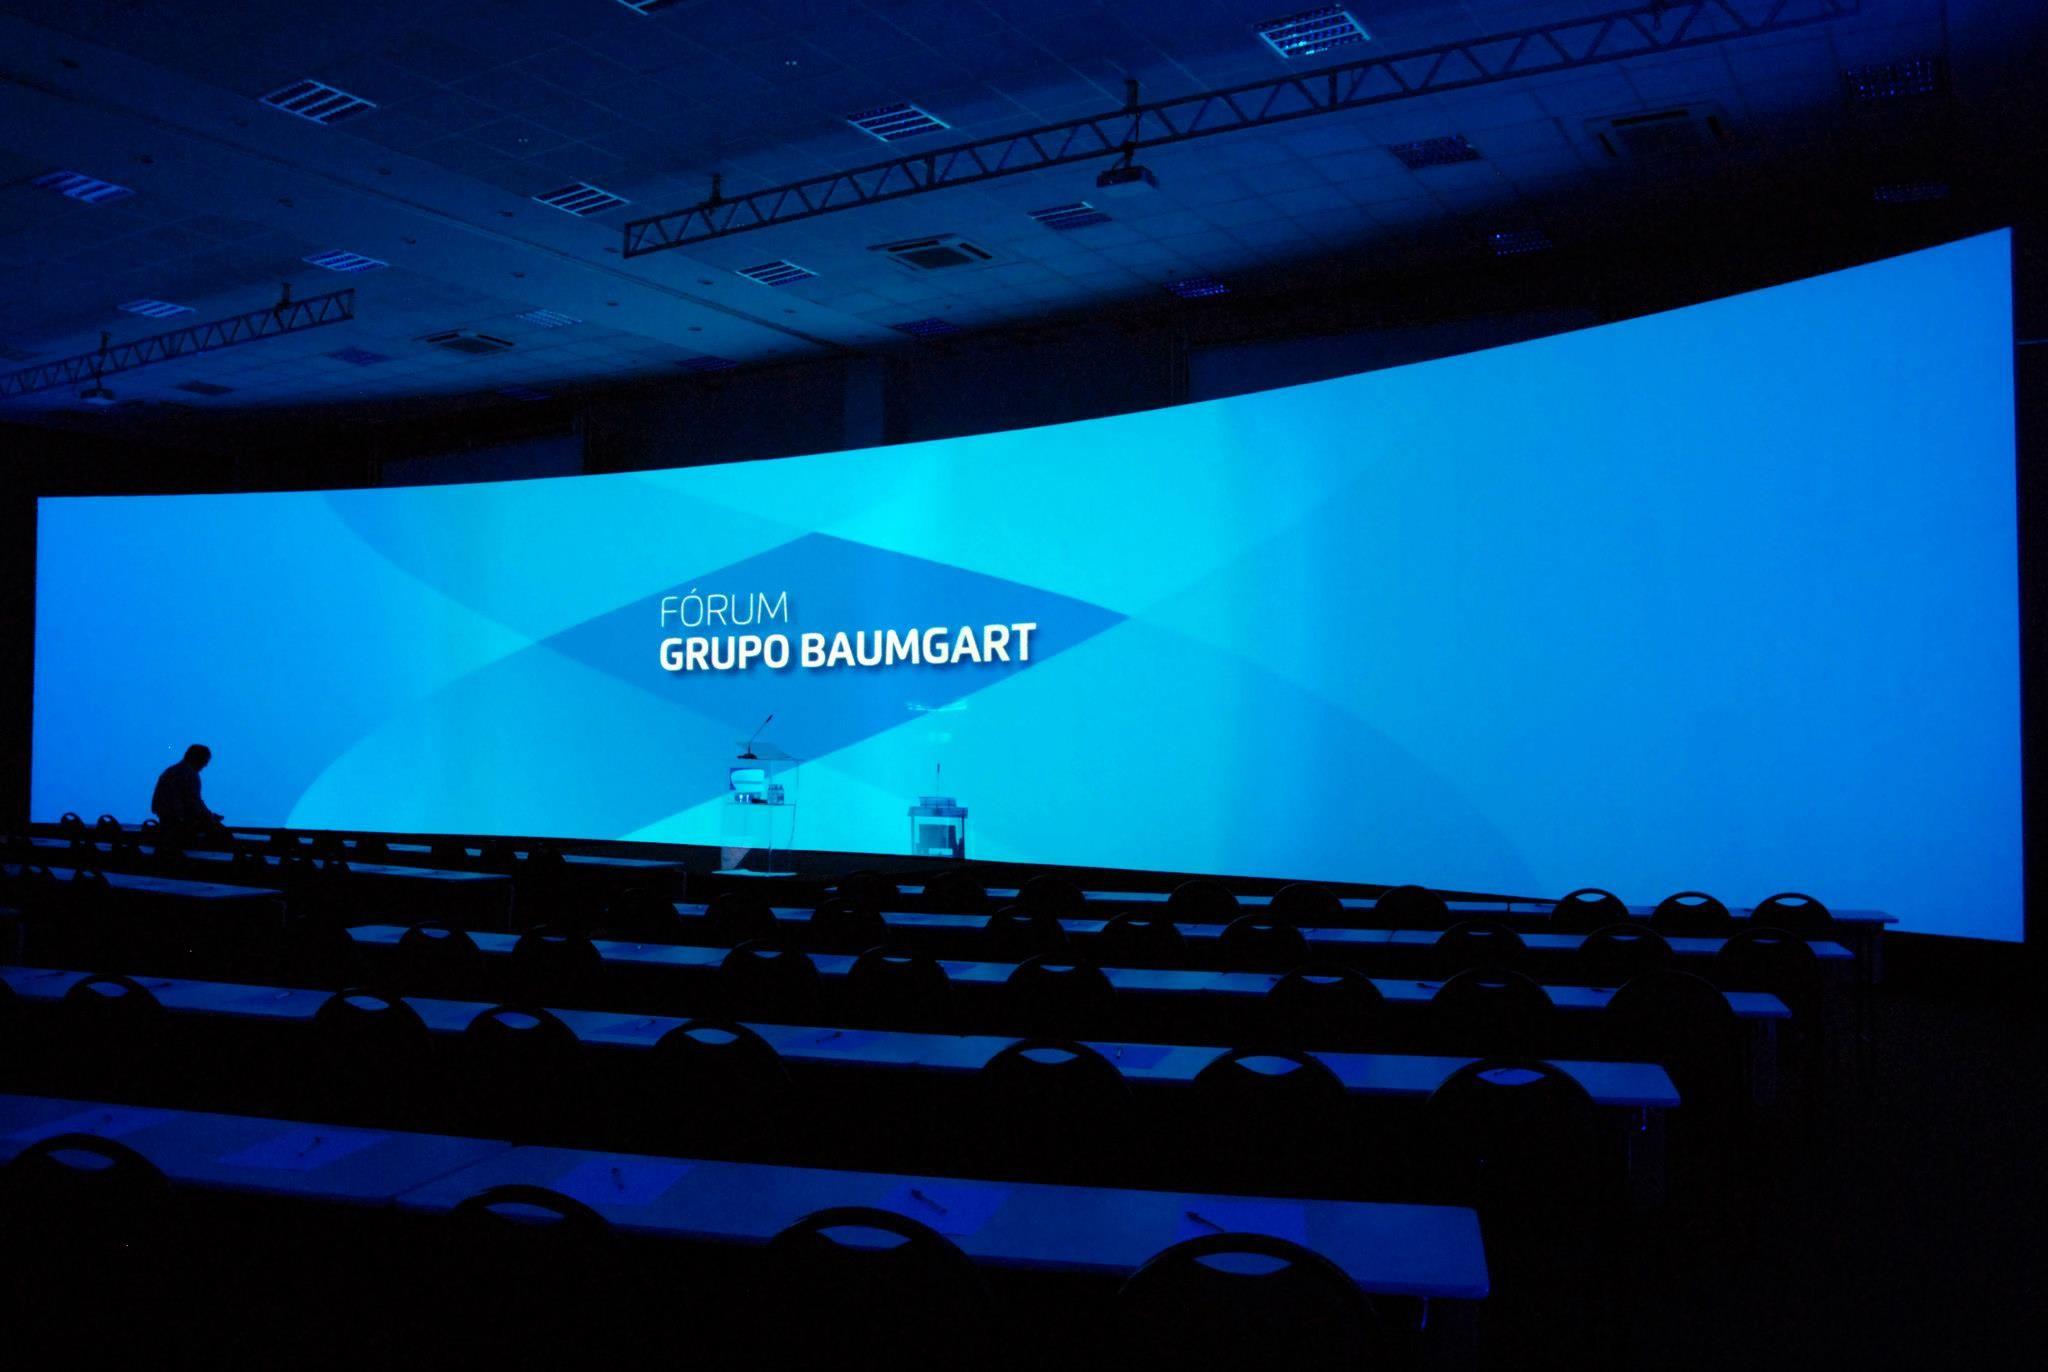 Fórum Grupo Baumgart